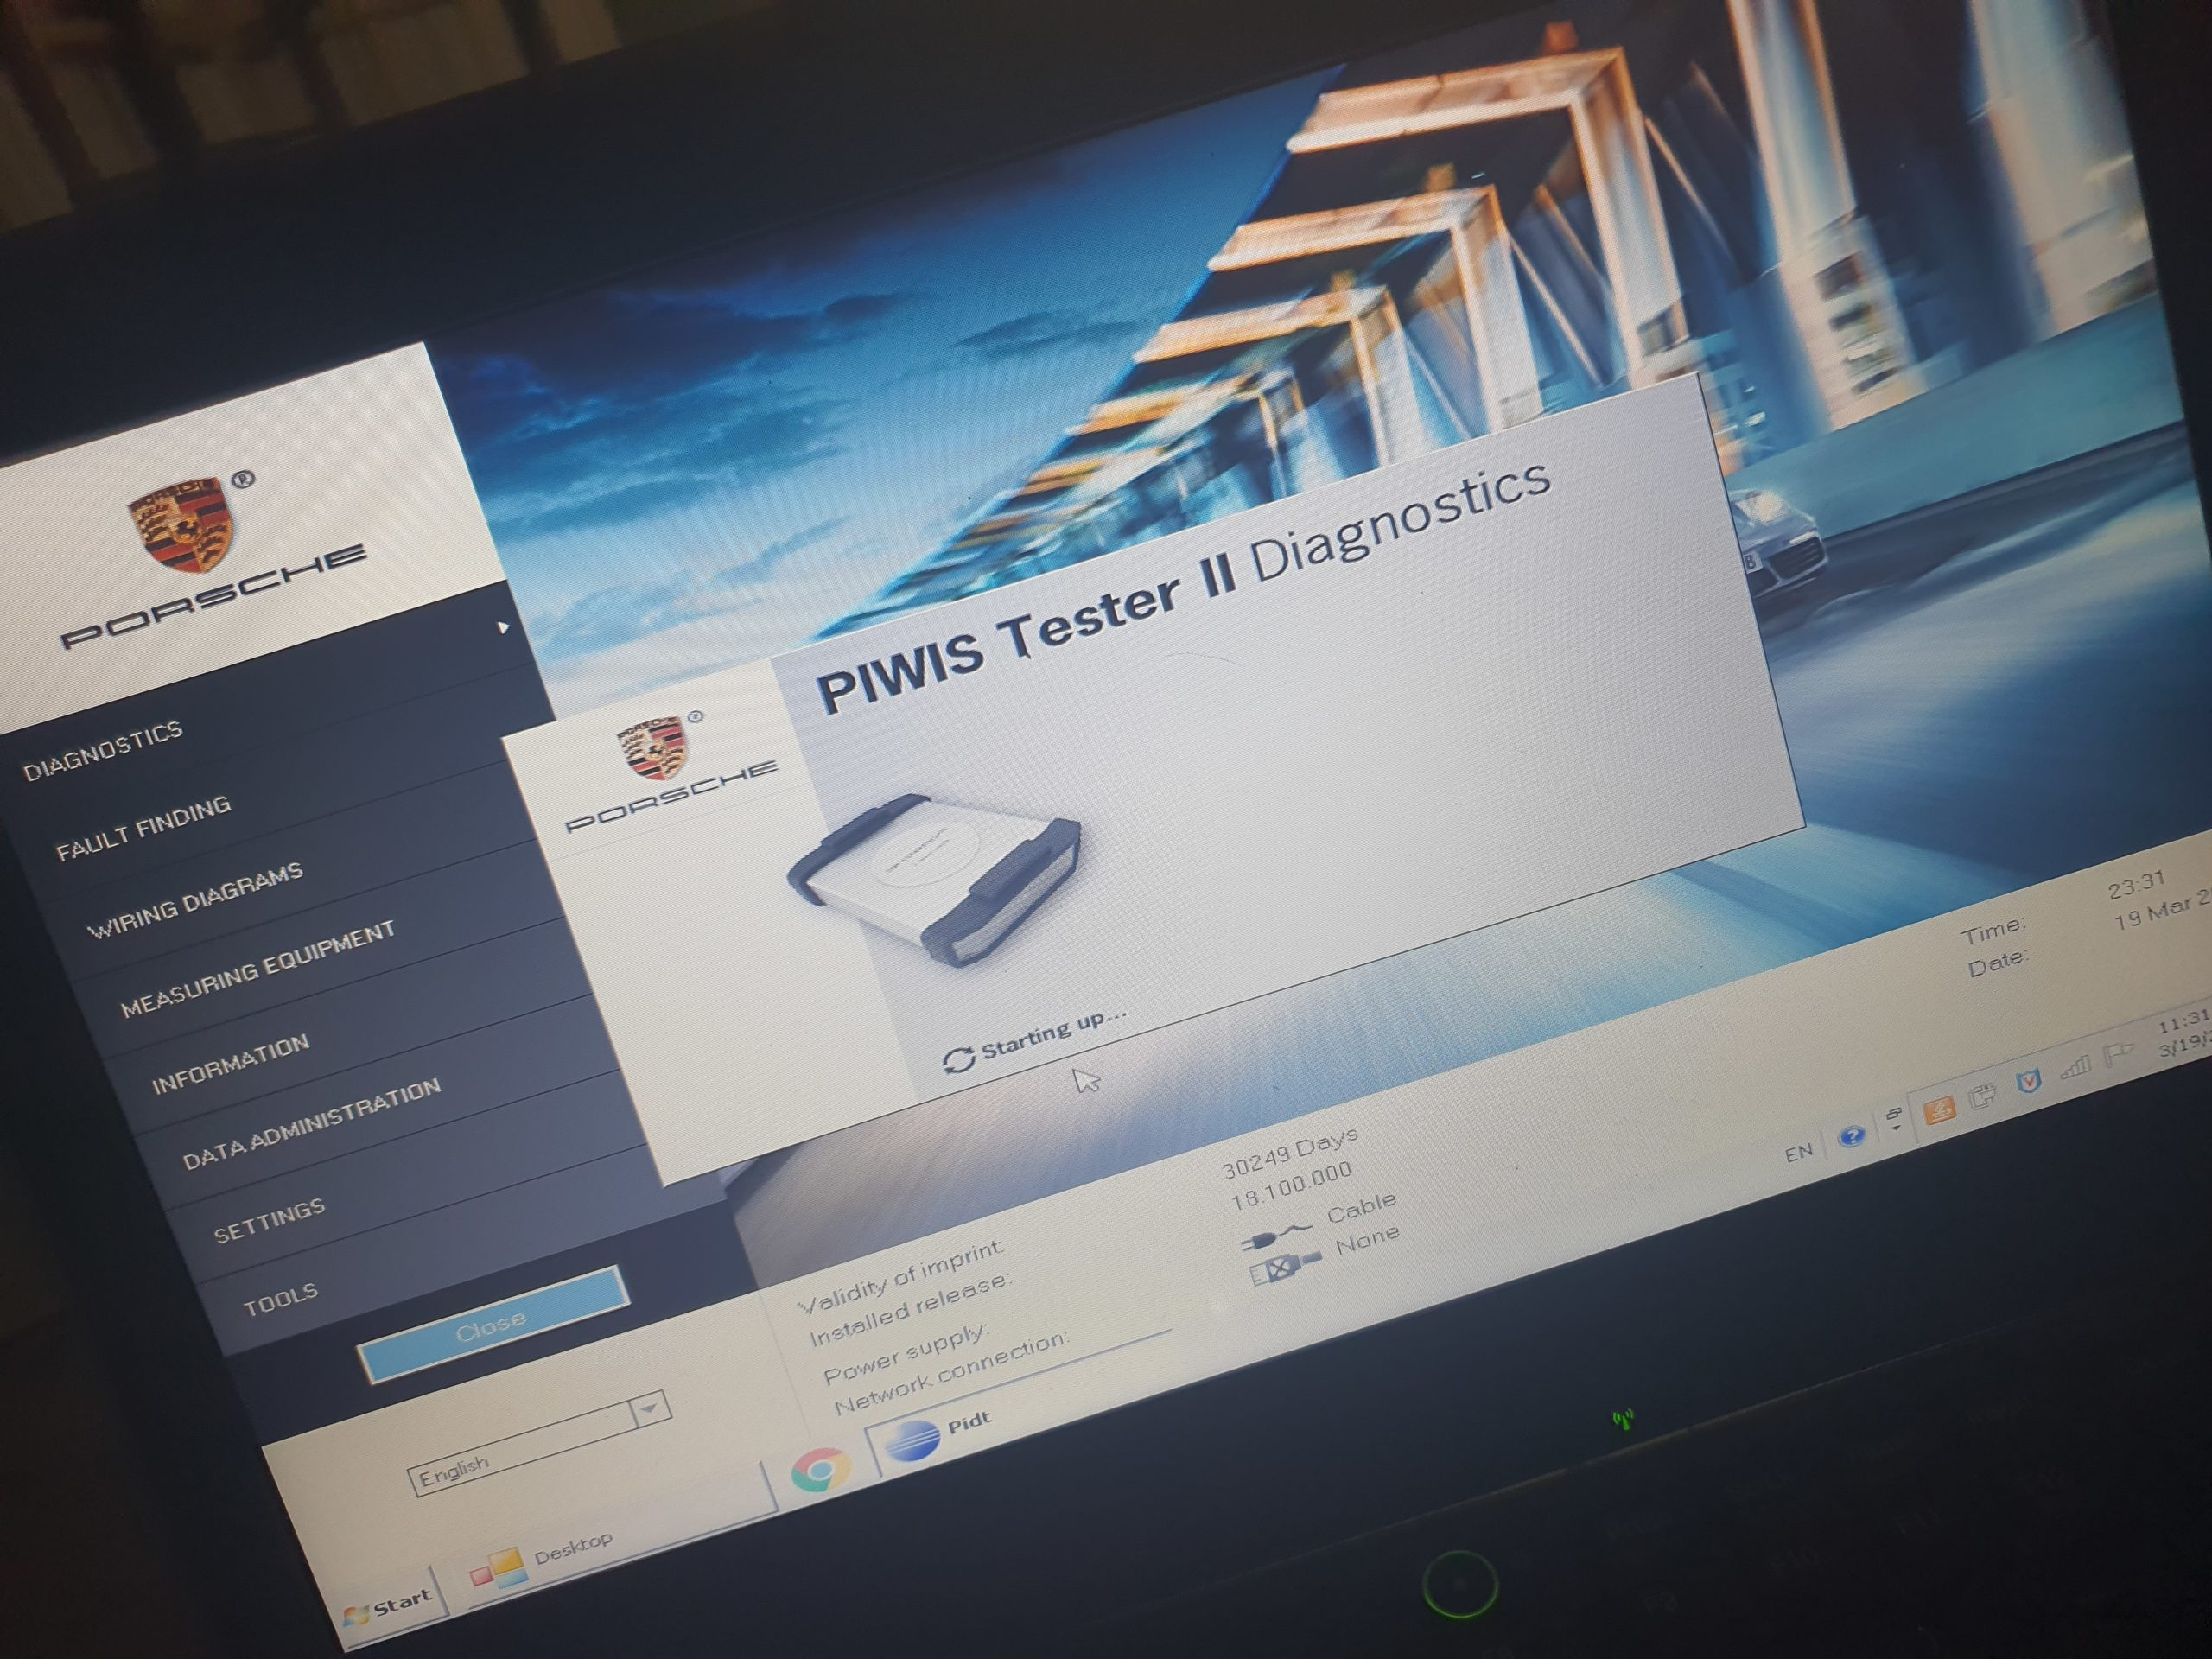 Porsche PIWIS OEM Diagnostics